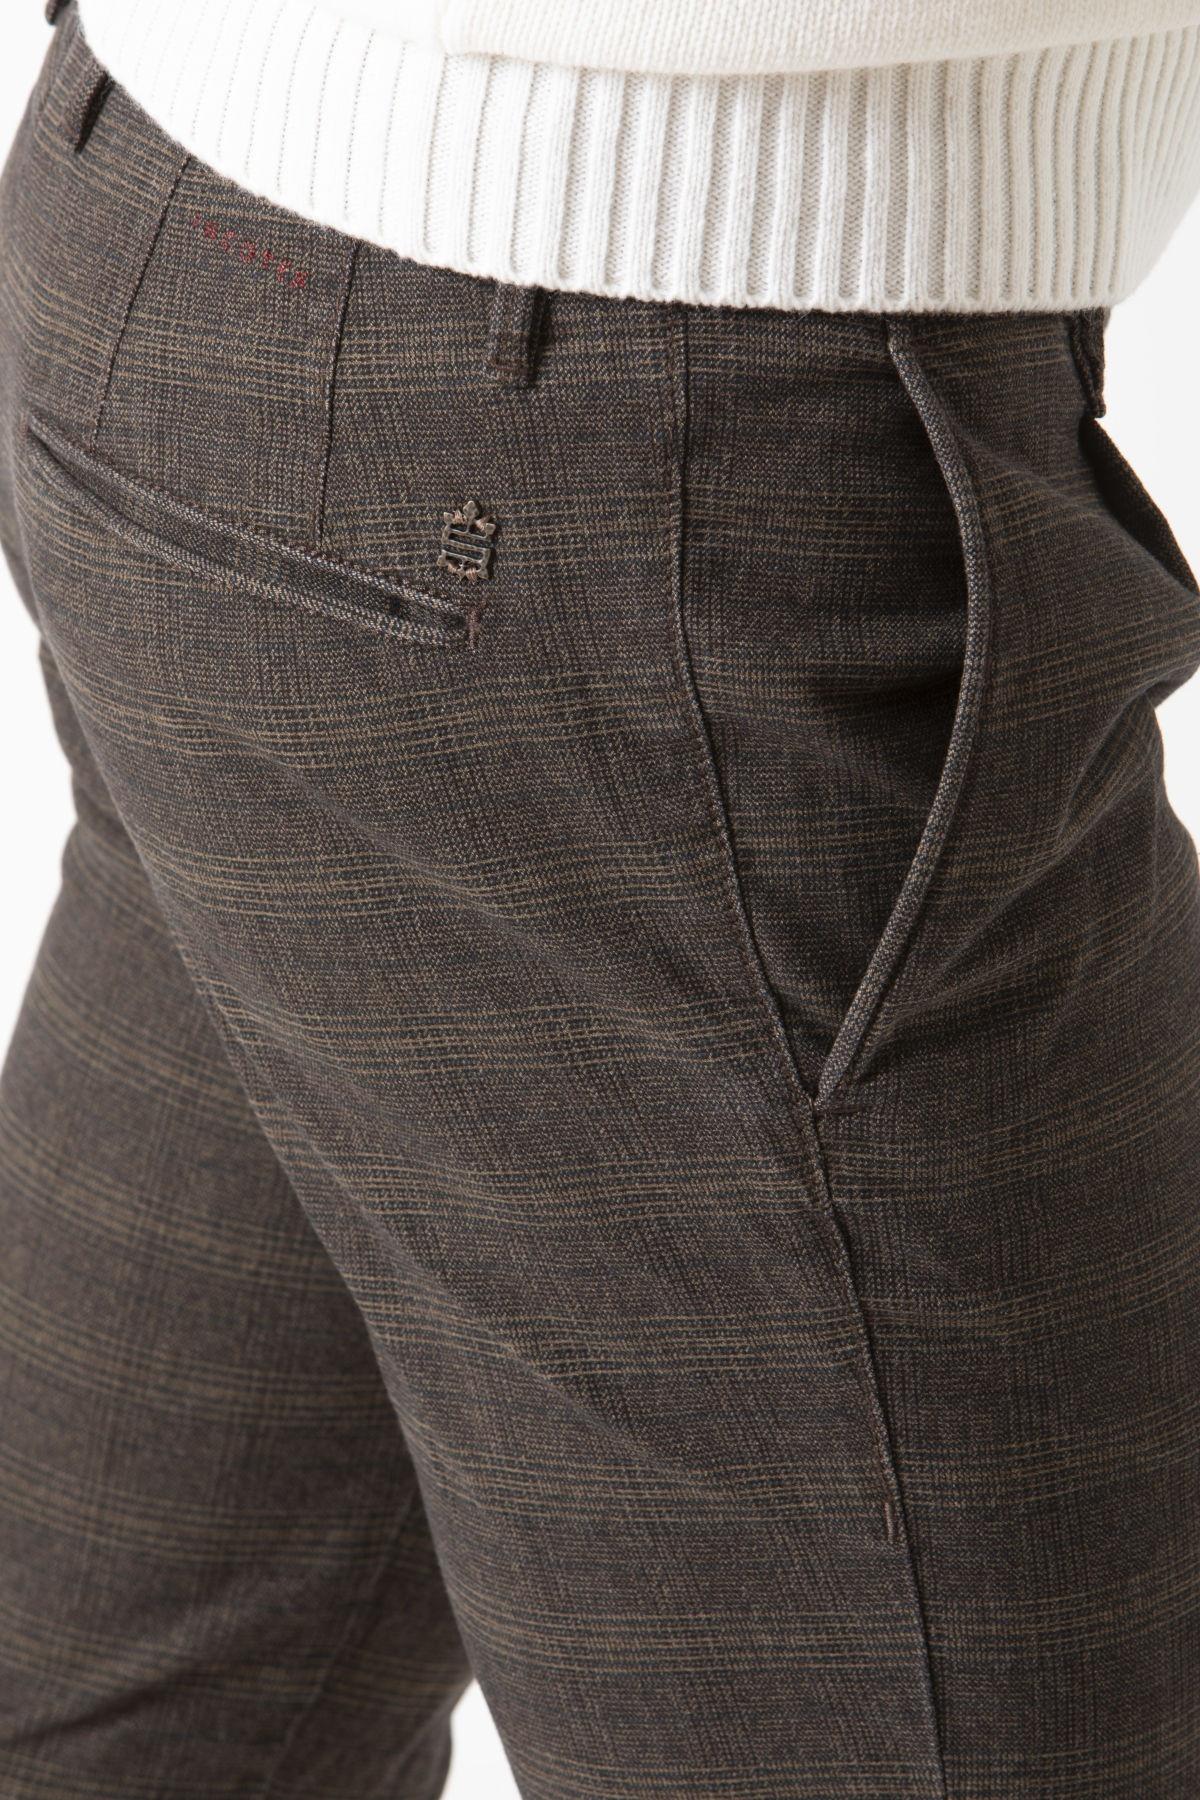 Pantaloni SLACKS per uomo INCOTEX A/I 19-20